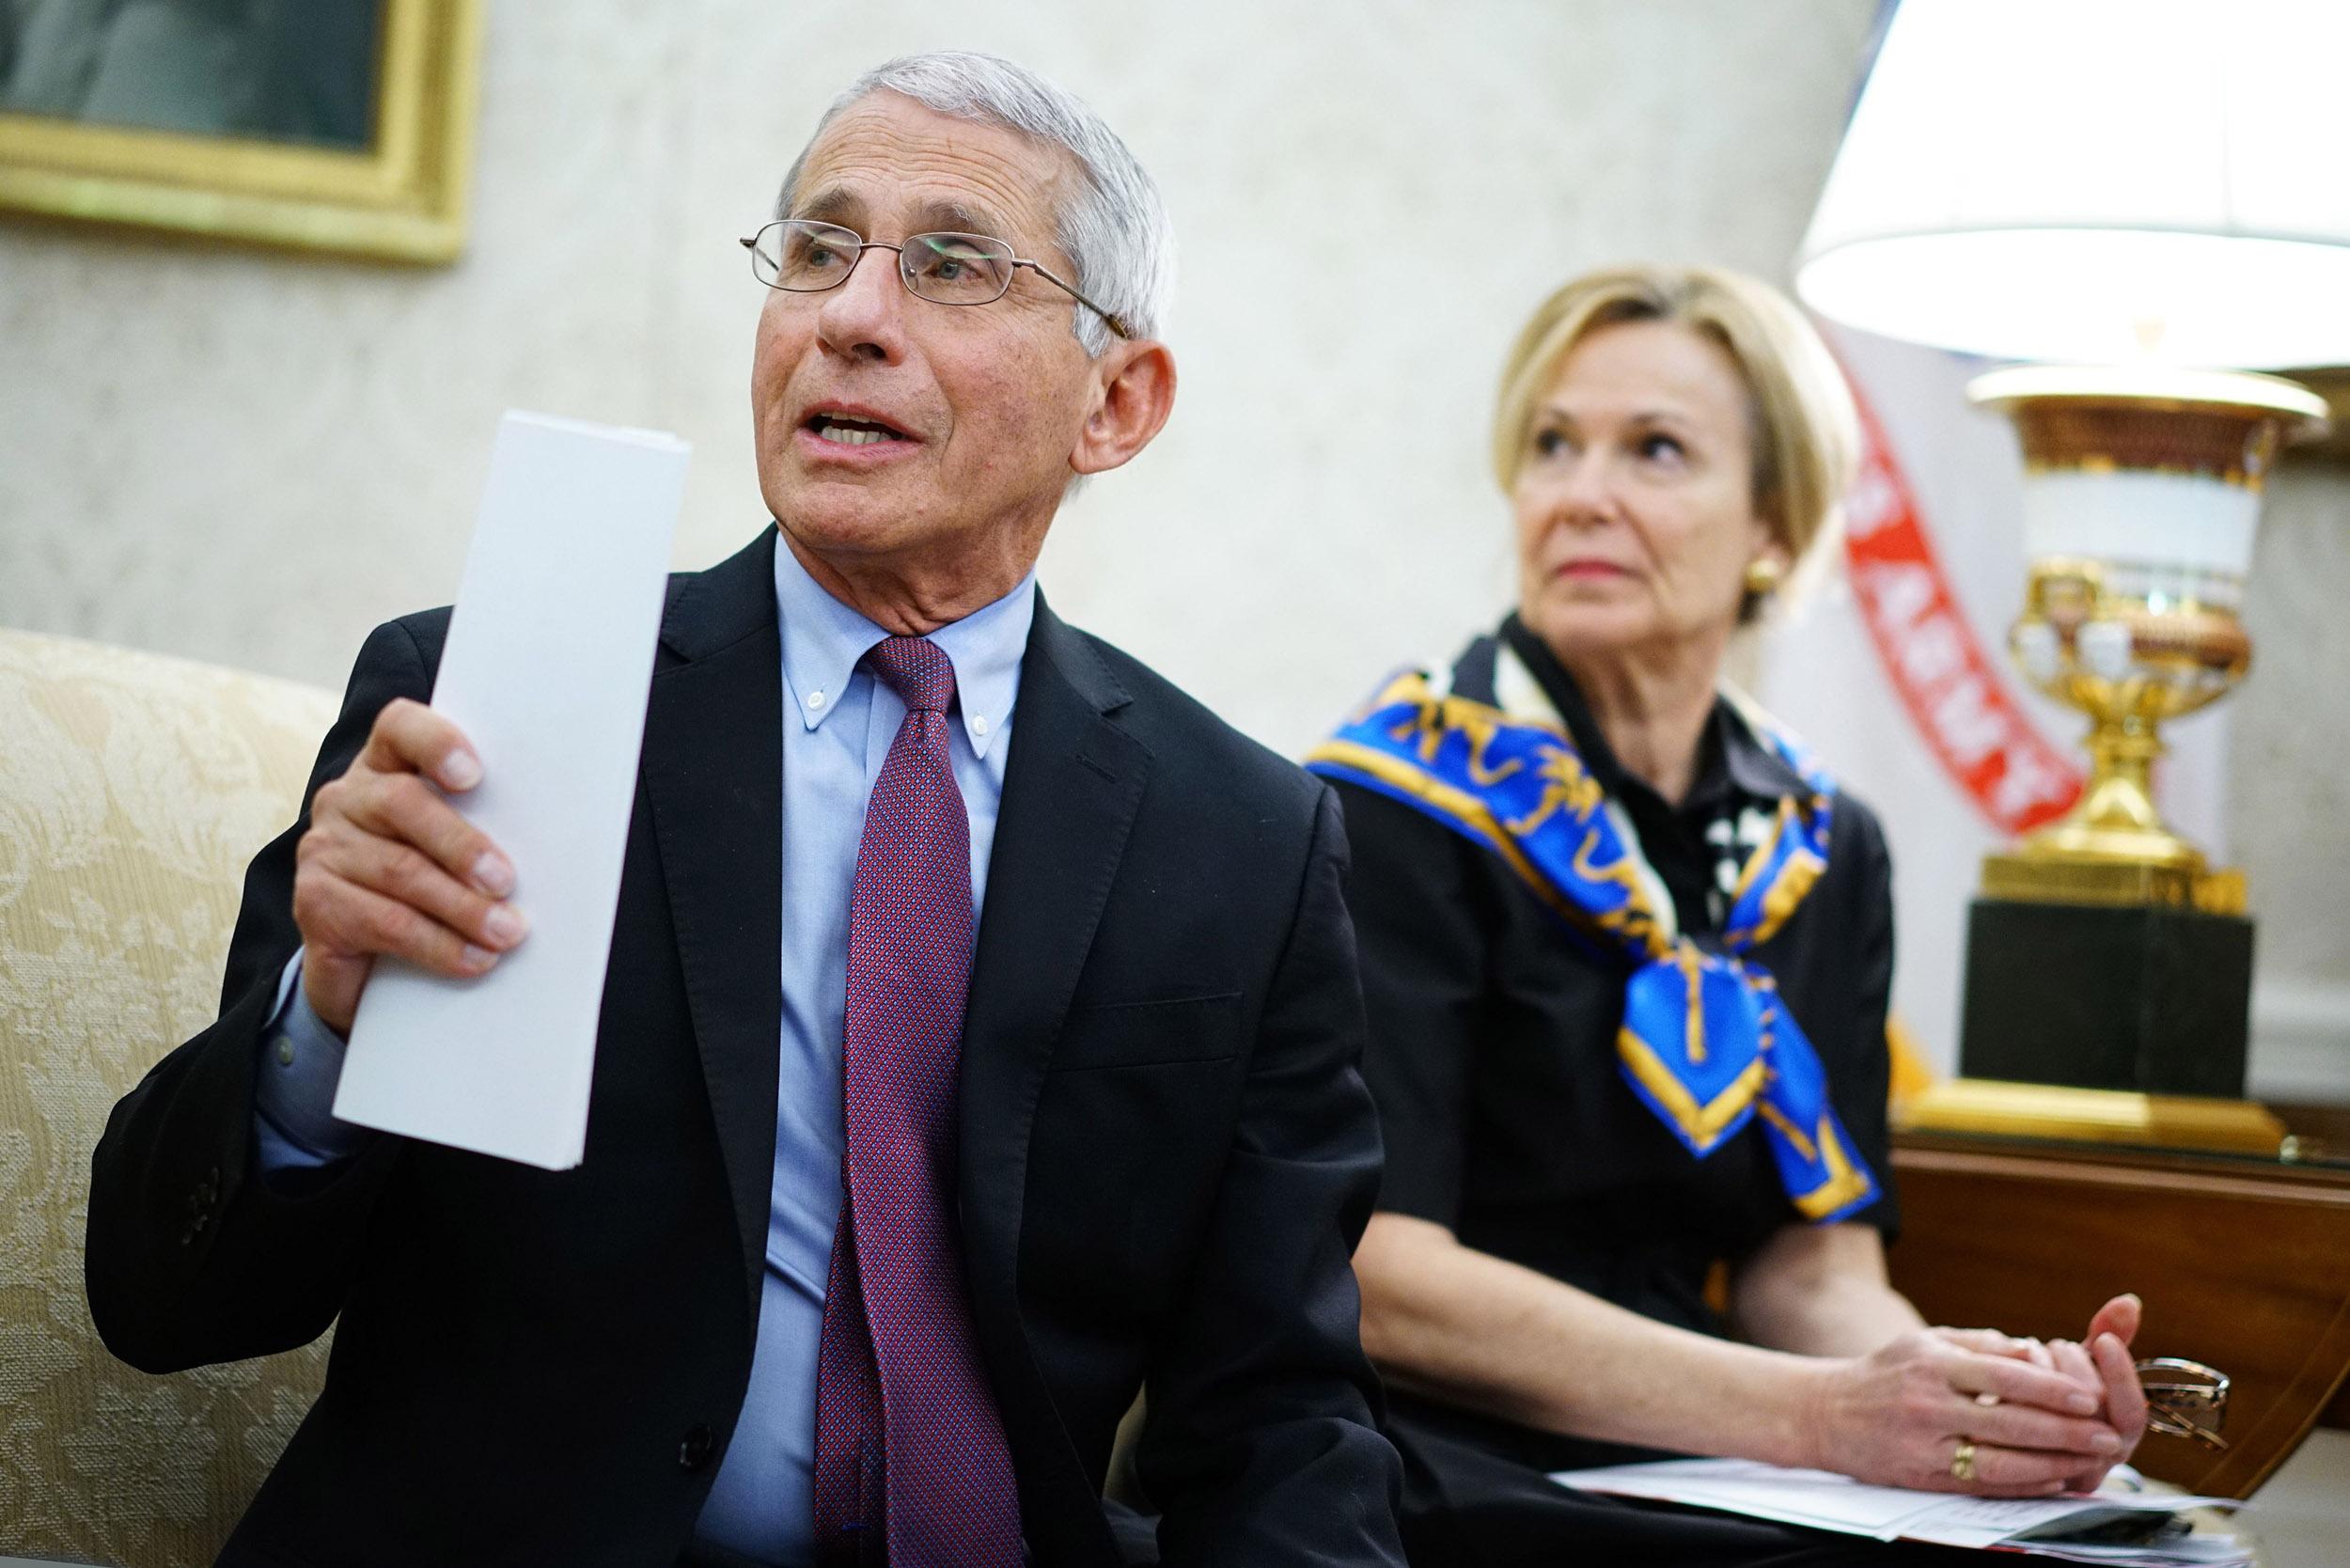 Dr. Anthony Fauci, left, with White House Coronavirus Task Force response coordinator Deborah Birx in Washington, DC on April 29.